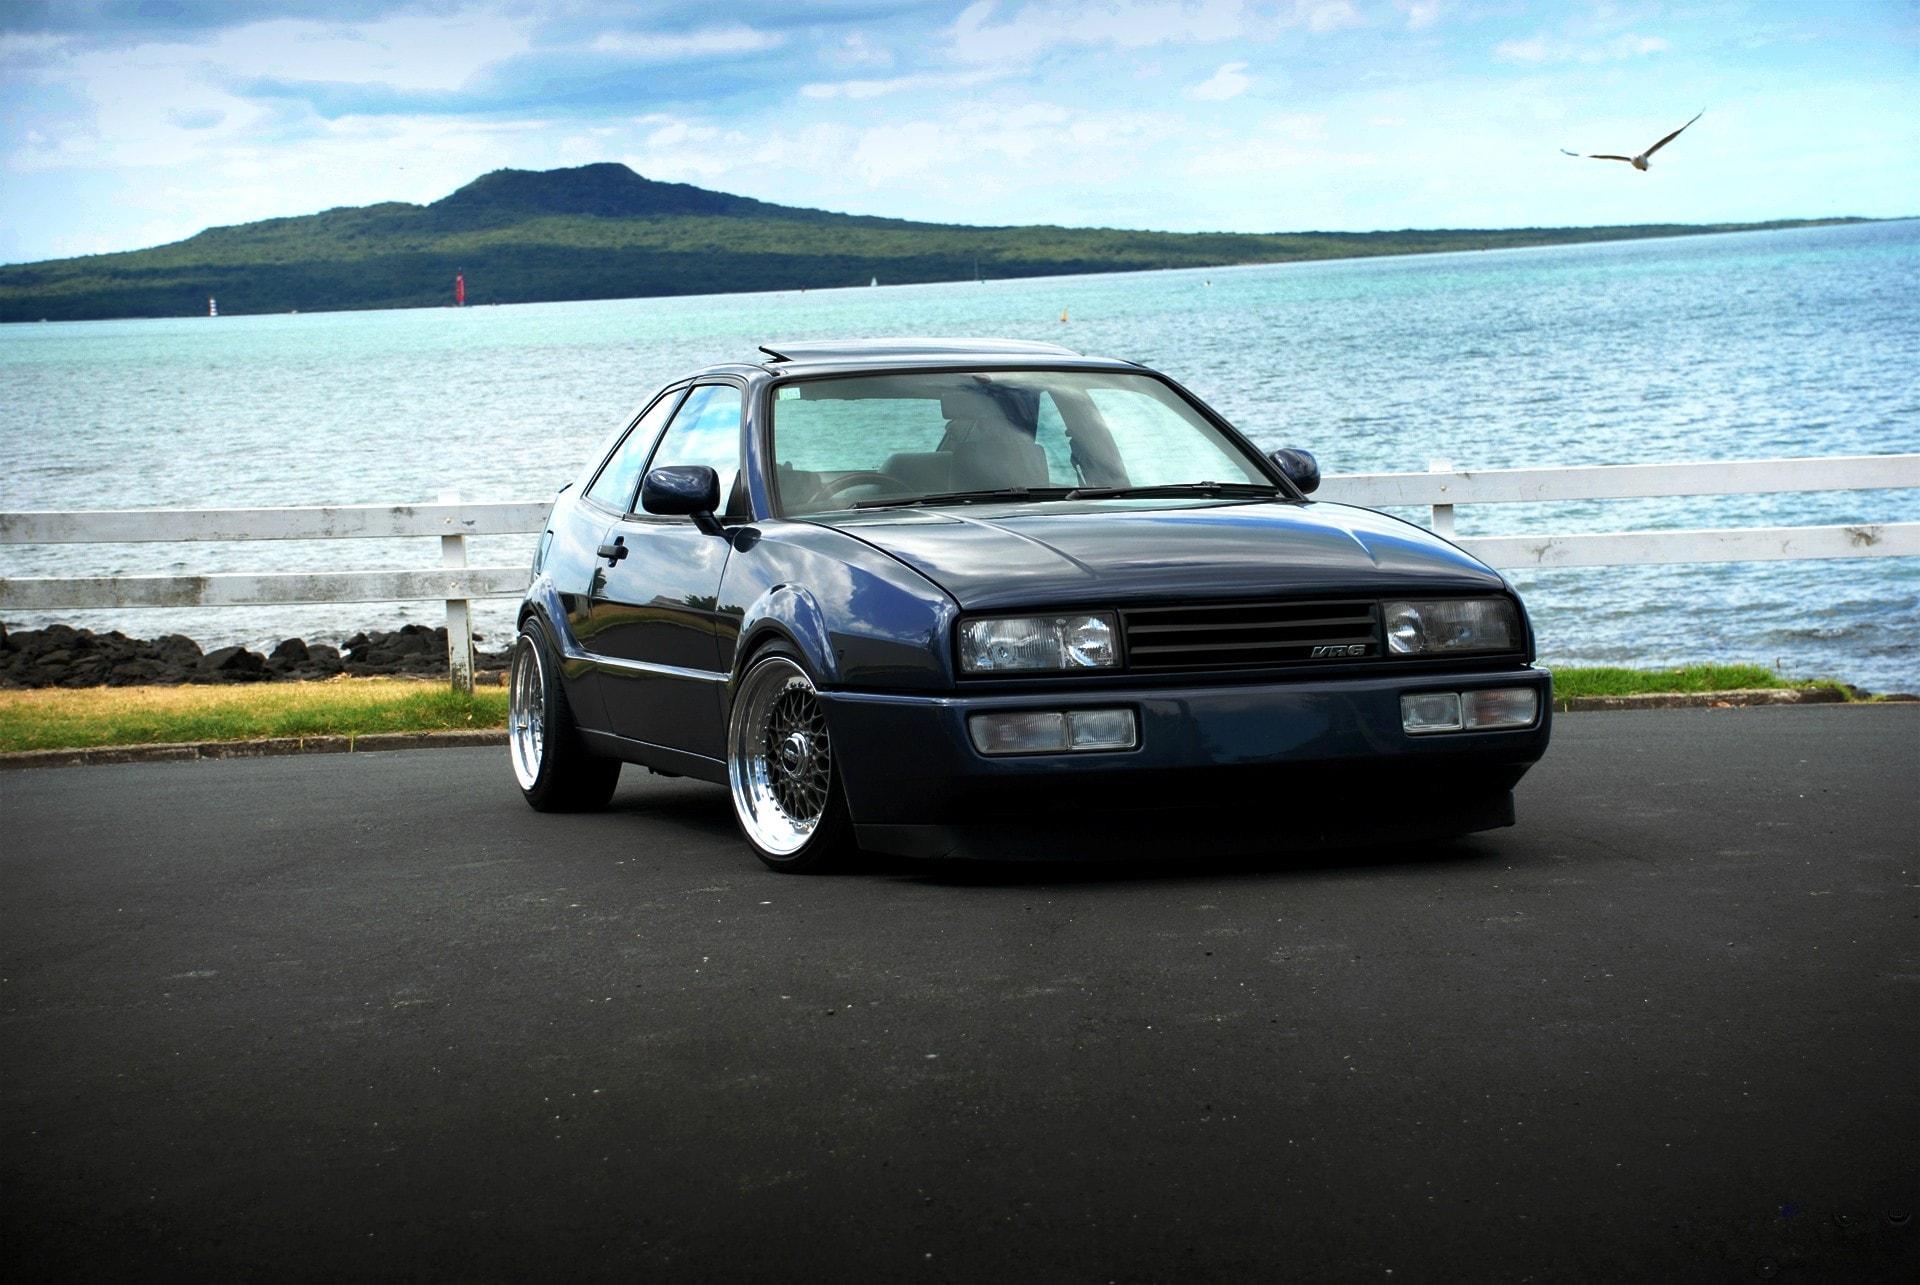 Volkswagen Corrado Pictures